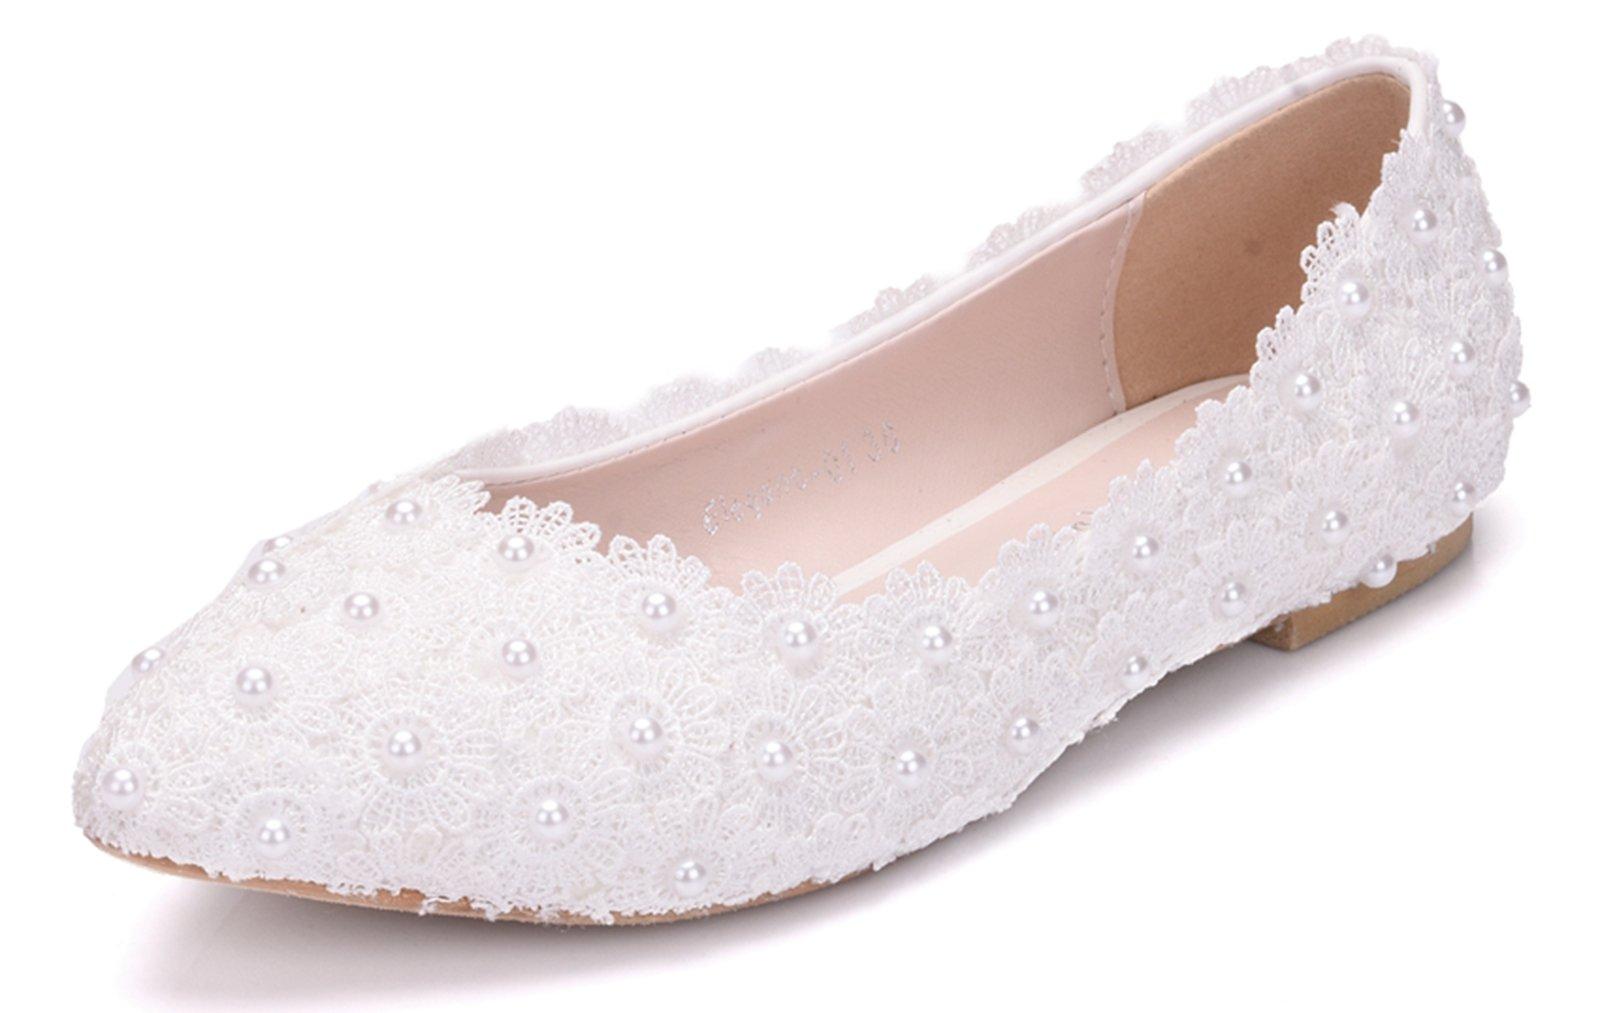 Melesh White Lace Flower Pearls Bride Flat Shoes For Wedding (7.5 B(M) US - EU38)